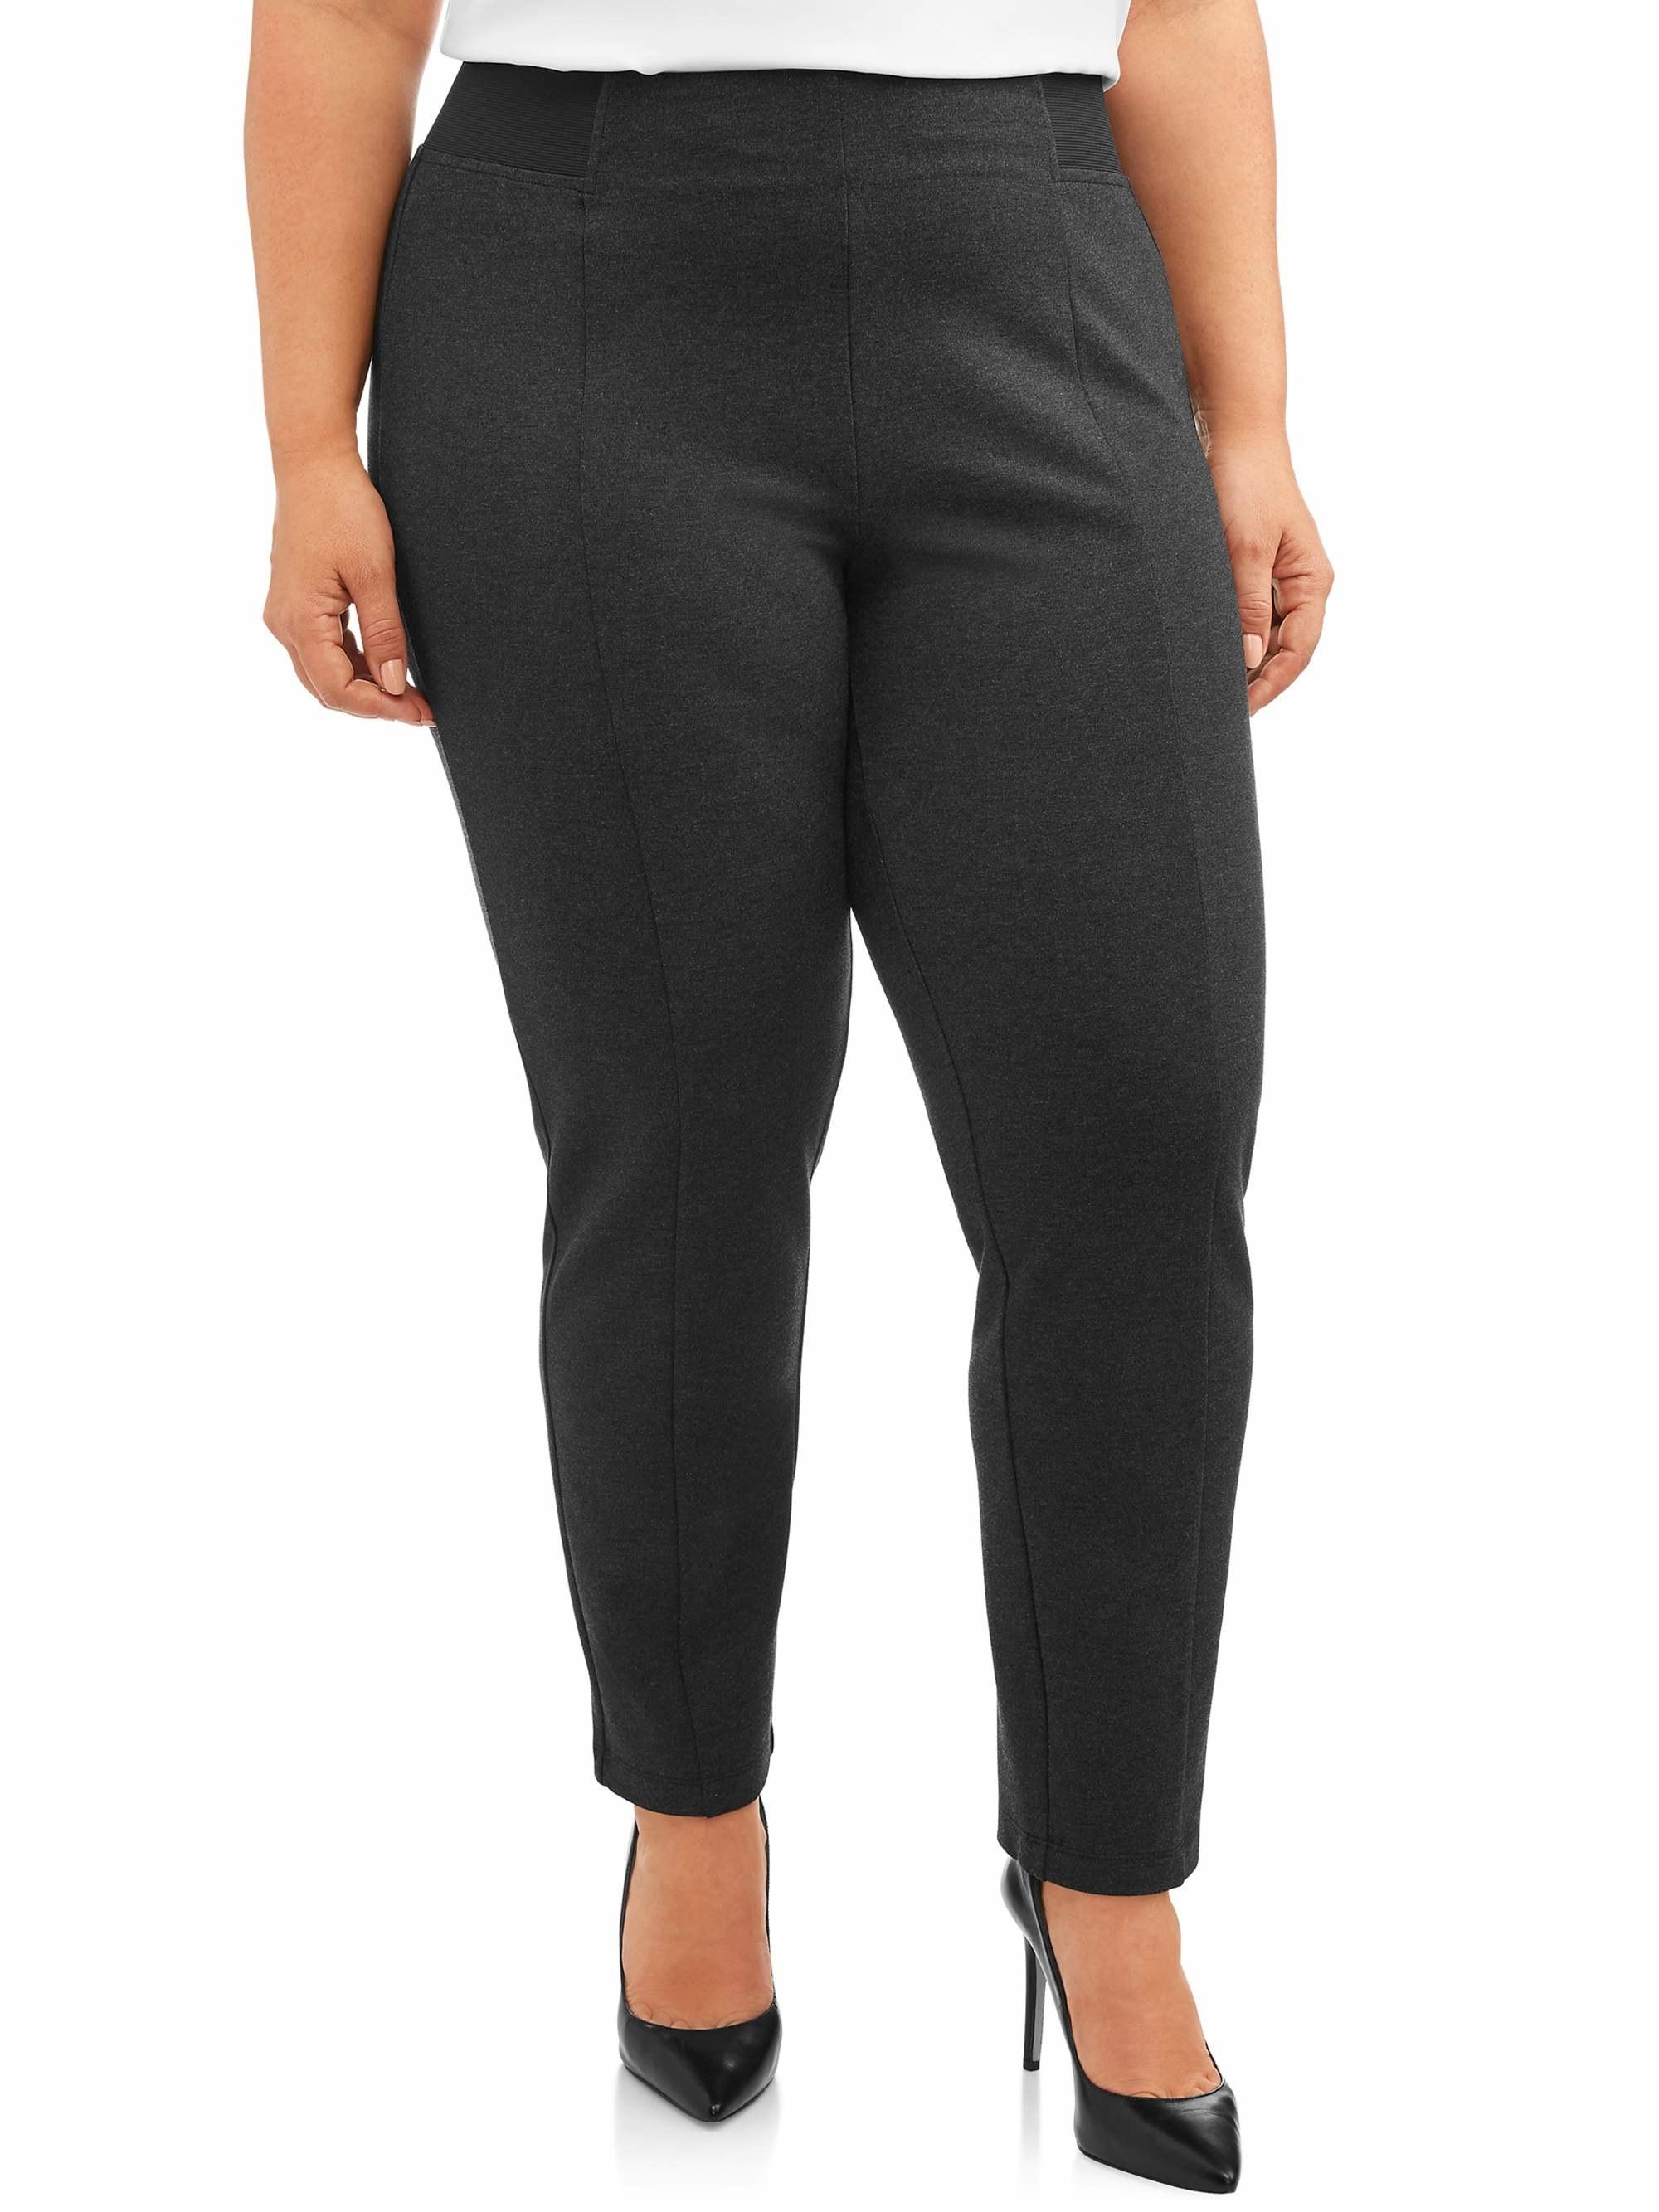 Model wearing grey pants